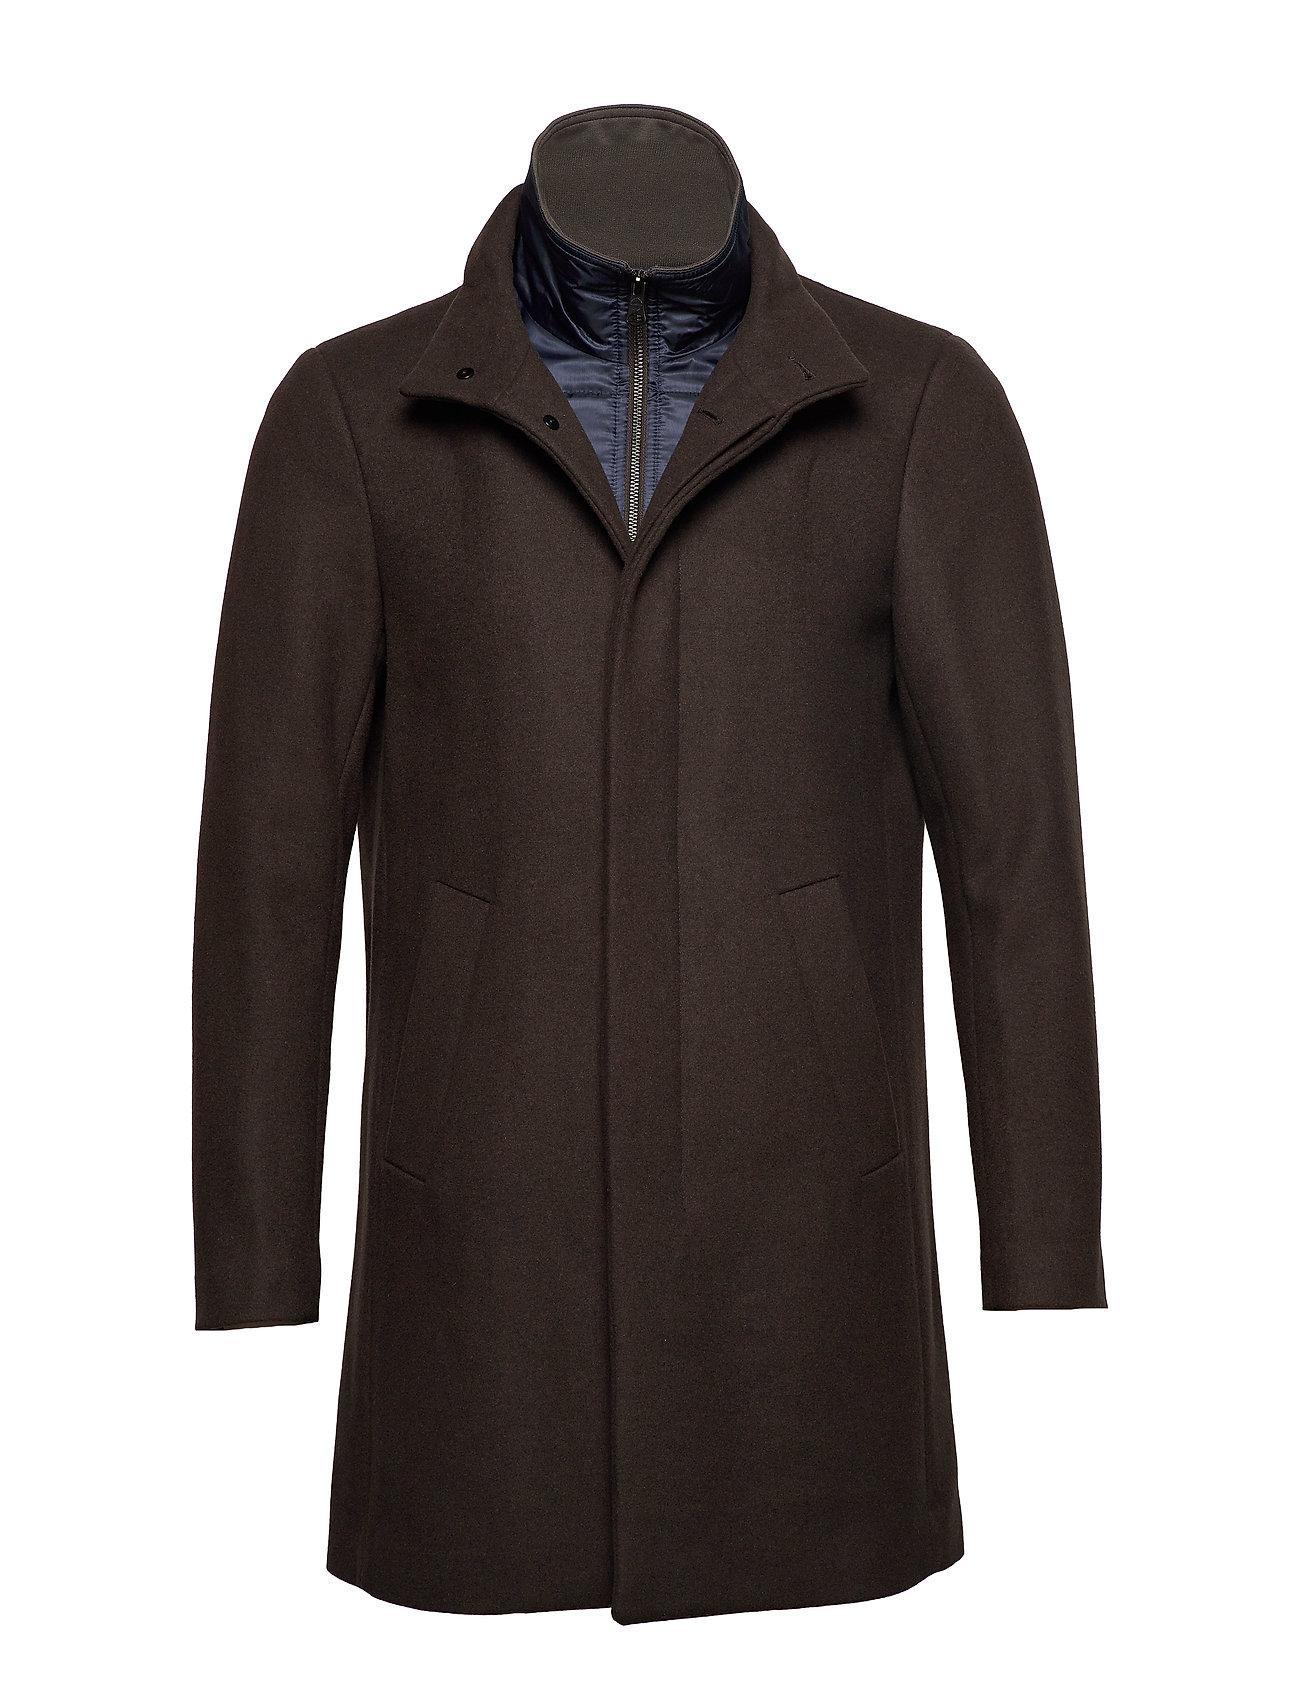 Matinique Harvey N Classic wool - DARK BROWN